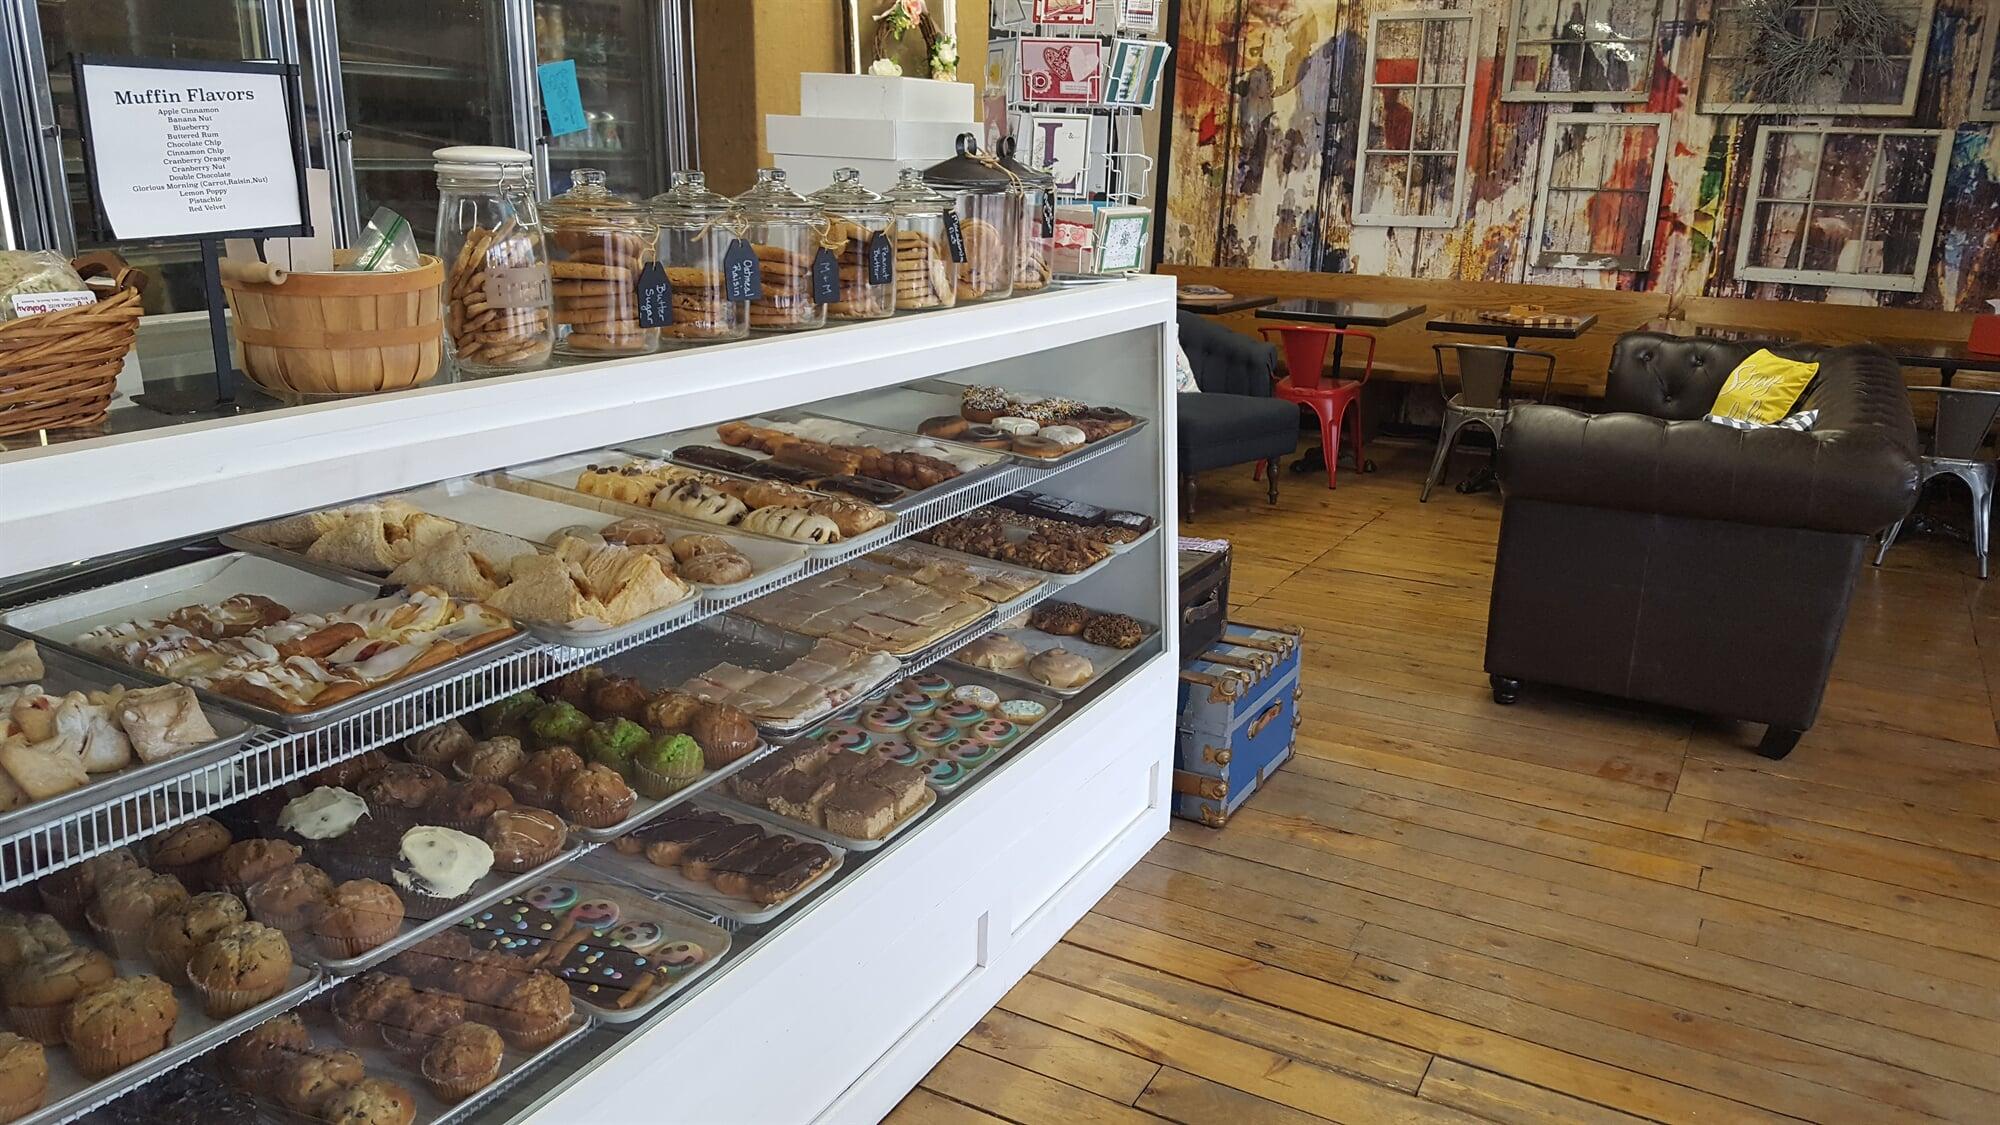 Display case of Breakfast treats and cookies